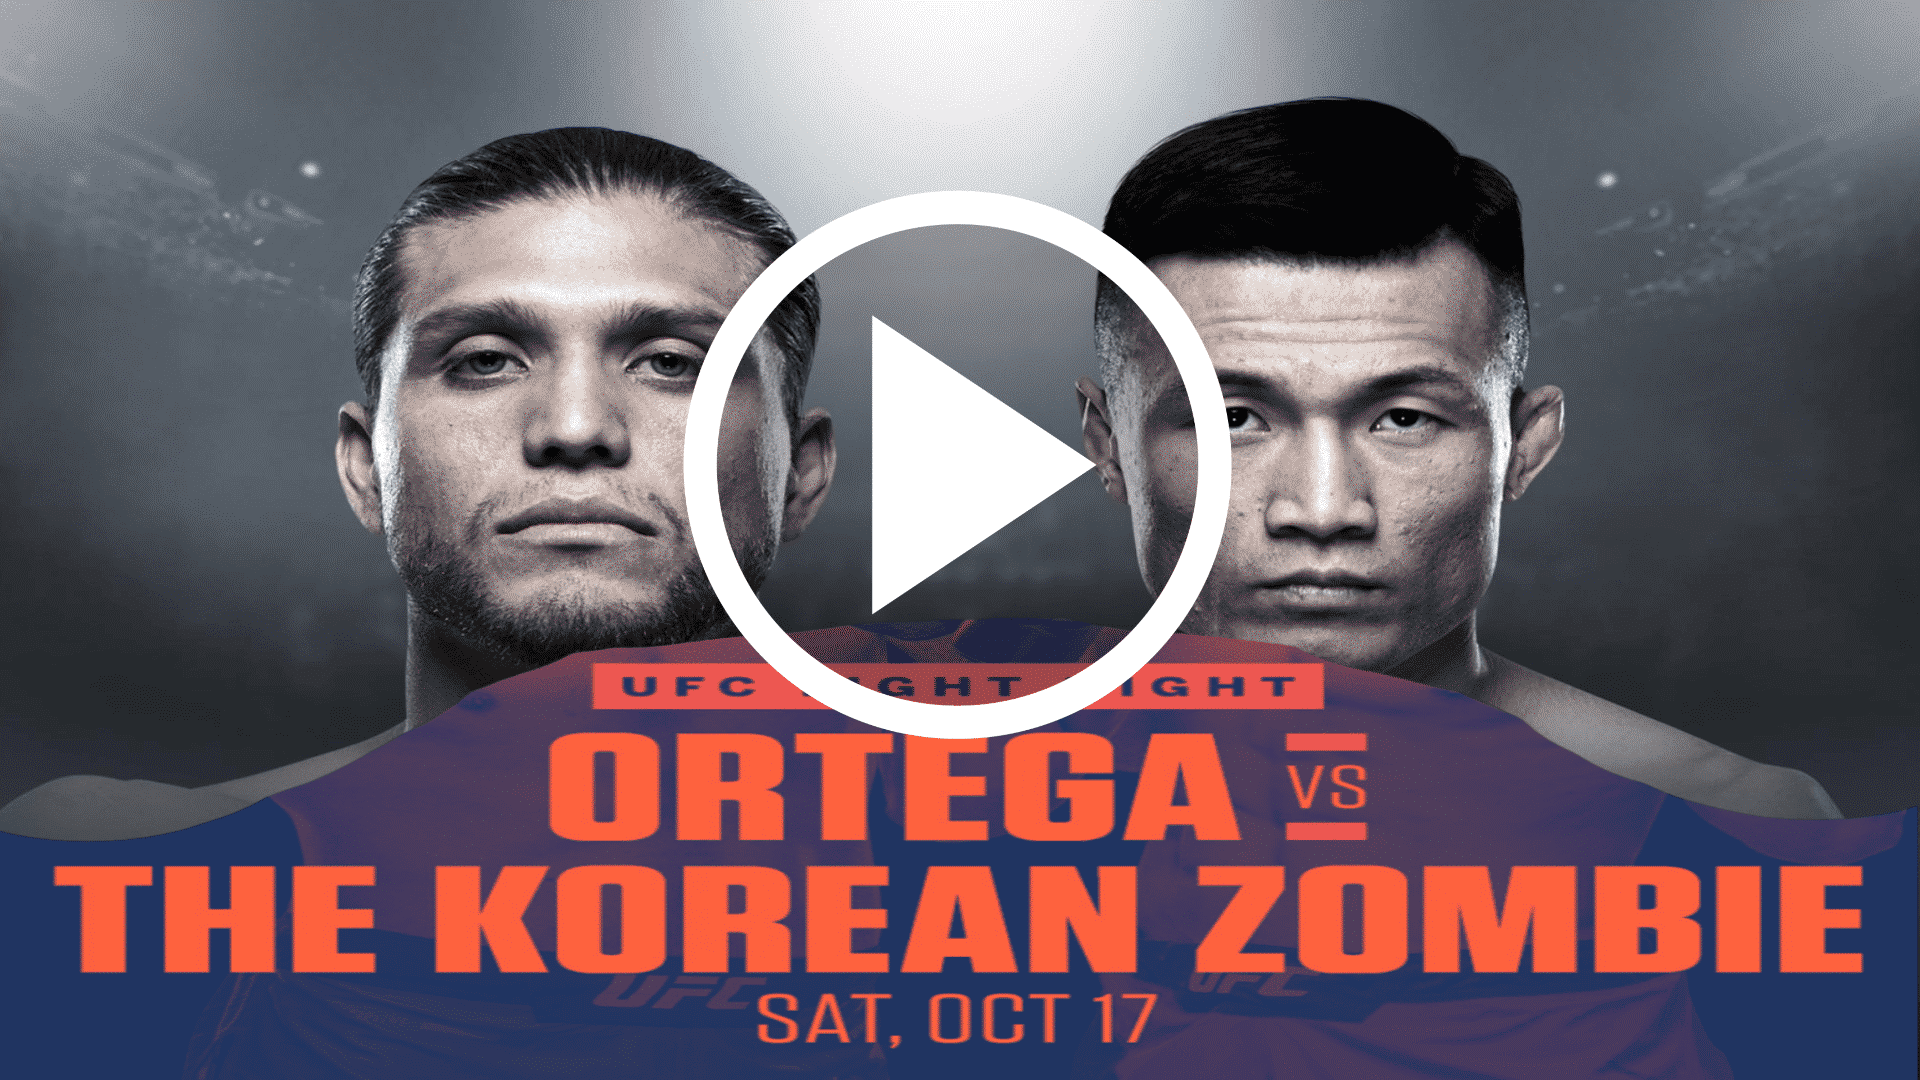 UFC EN VIVO HOY | UFC Fight Island 6 HOY EN VIVO: con Ortega vs. Jung